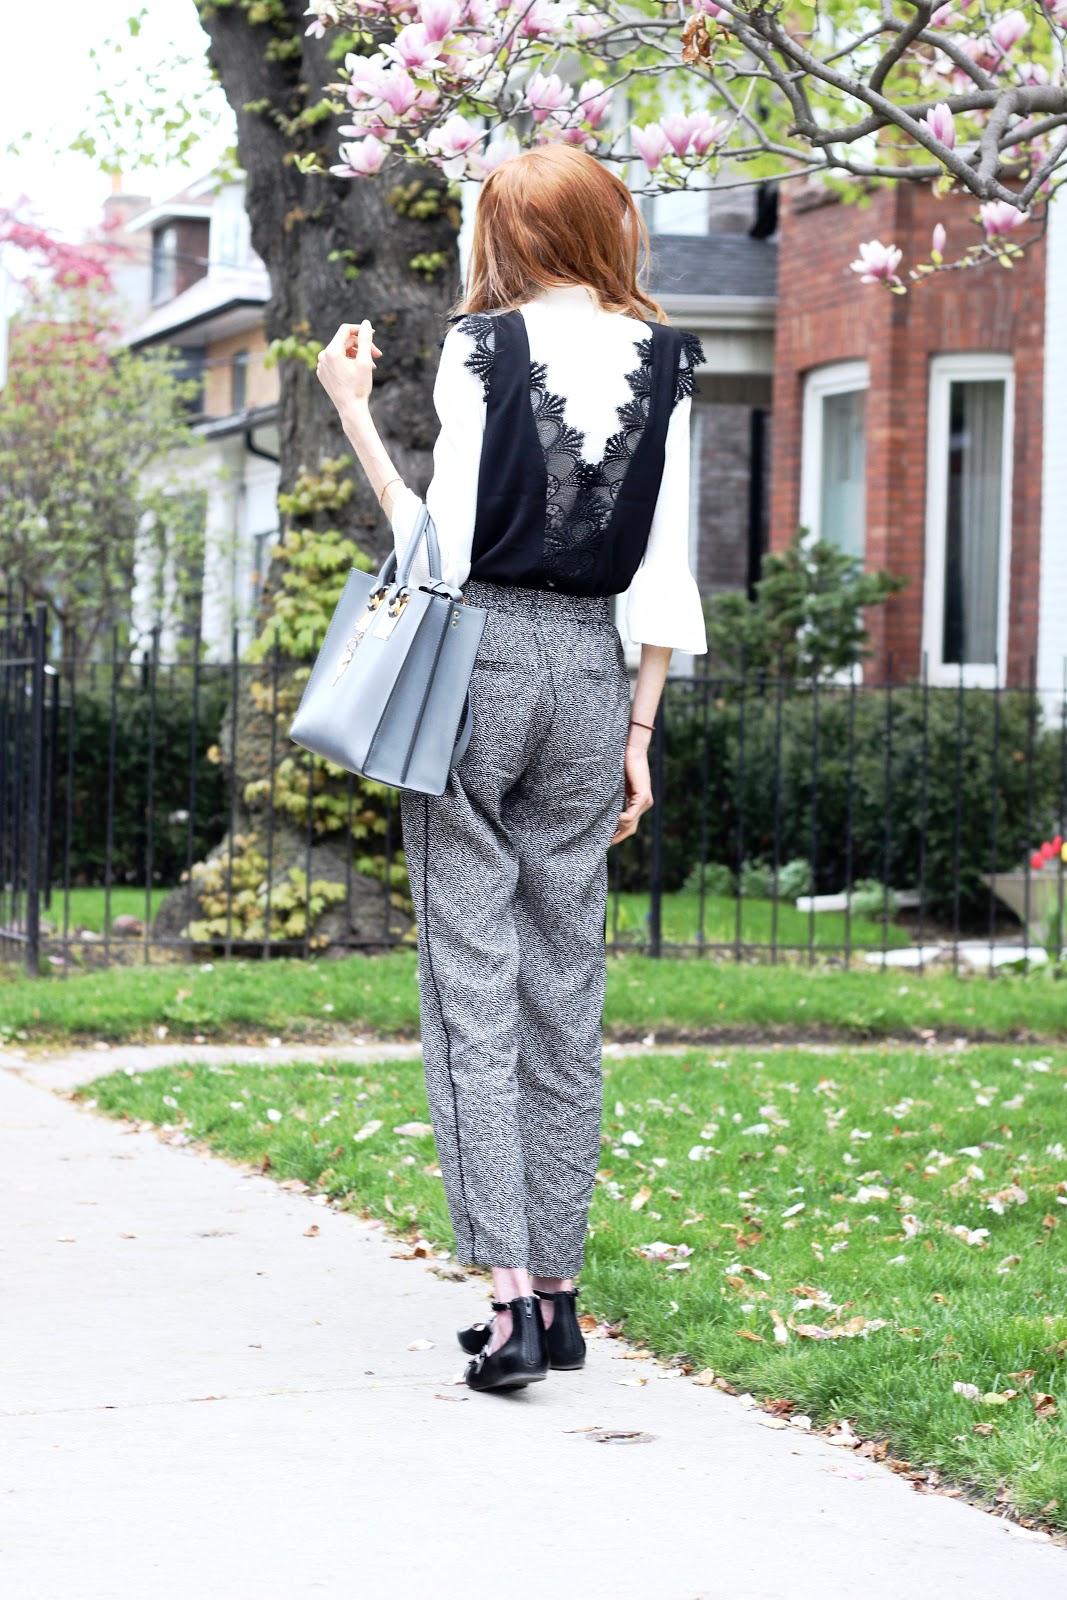 Vero Moda polka dot trousers, white mock neck knit, RW &CO lace cap sleeve blouse, Target flats, Sophie Hulme tote bag charcoal  grey, Celine Caty sunglasses